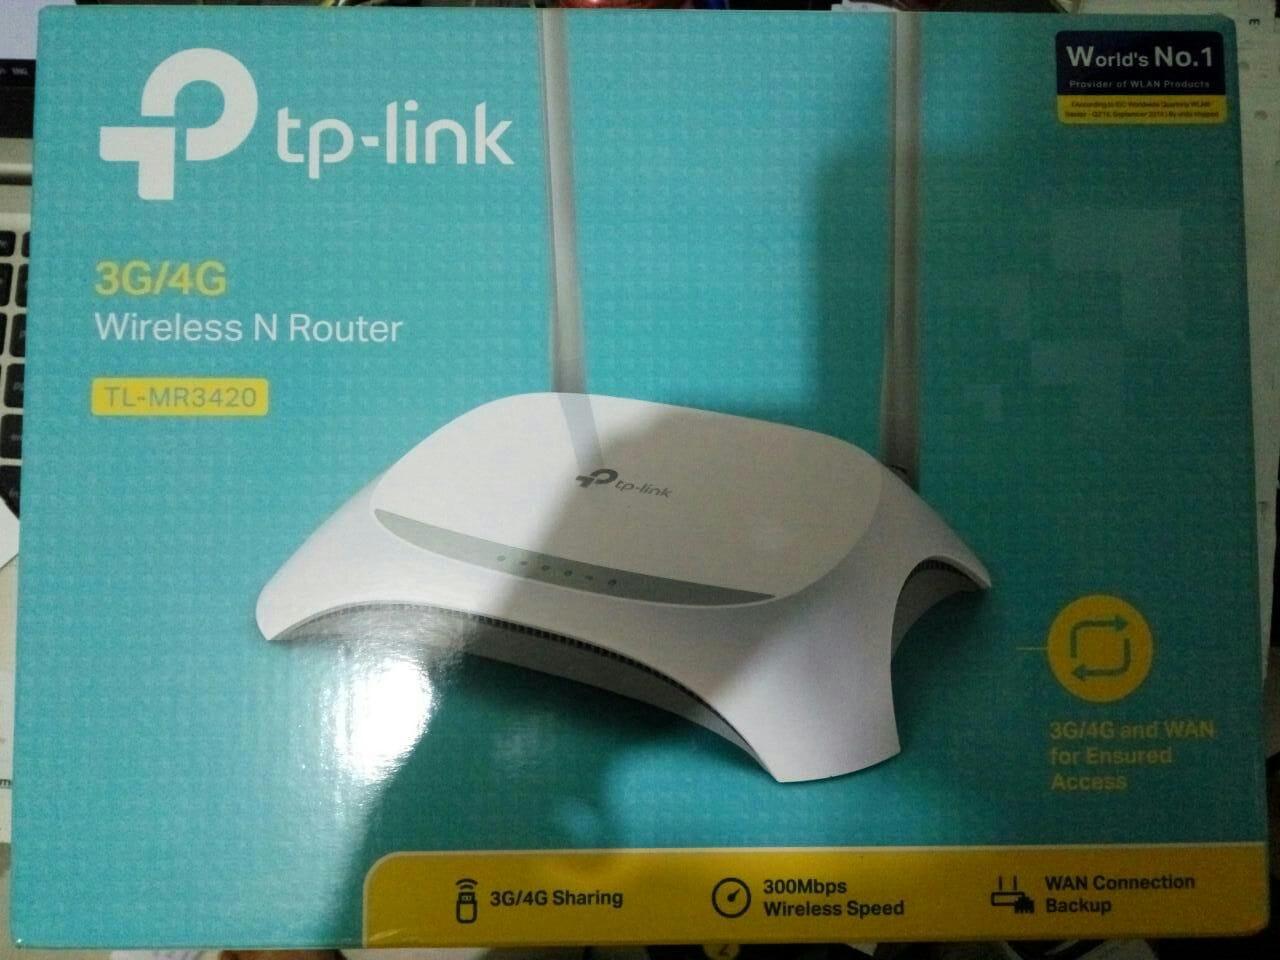 Jual Tp Link Tl Mr3420 V2 Versi 2 Terbaru 3g 4g Wireless N Tplink Router Takkii Shop Tokopedia